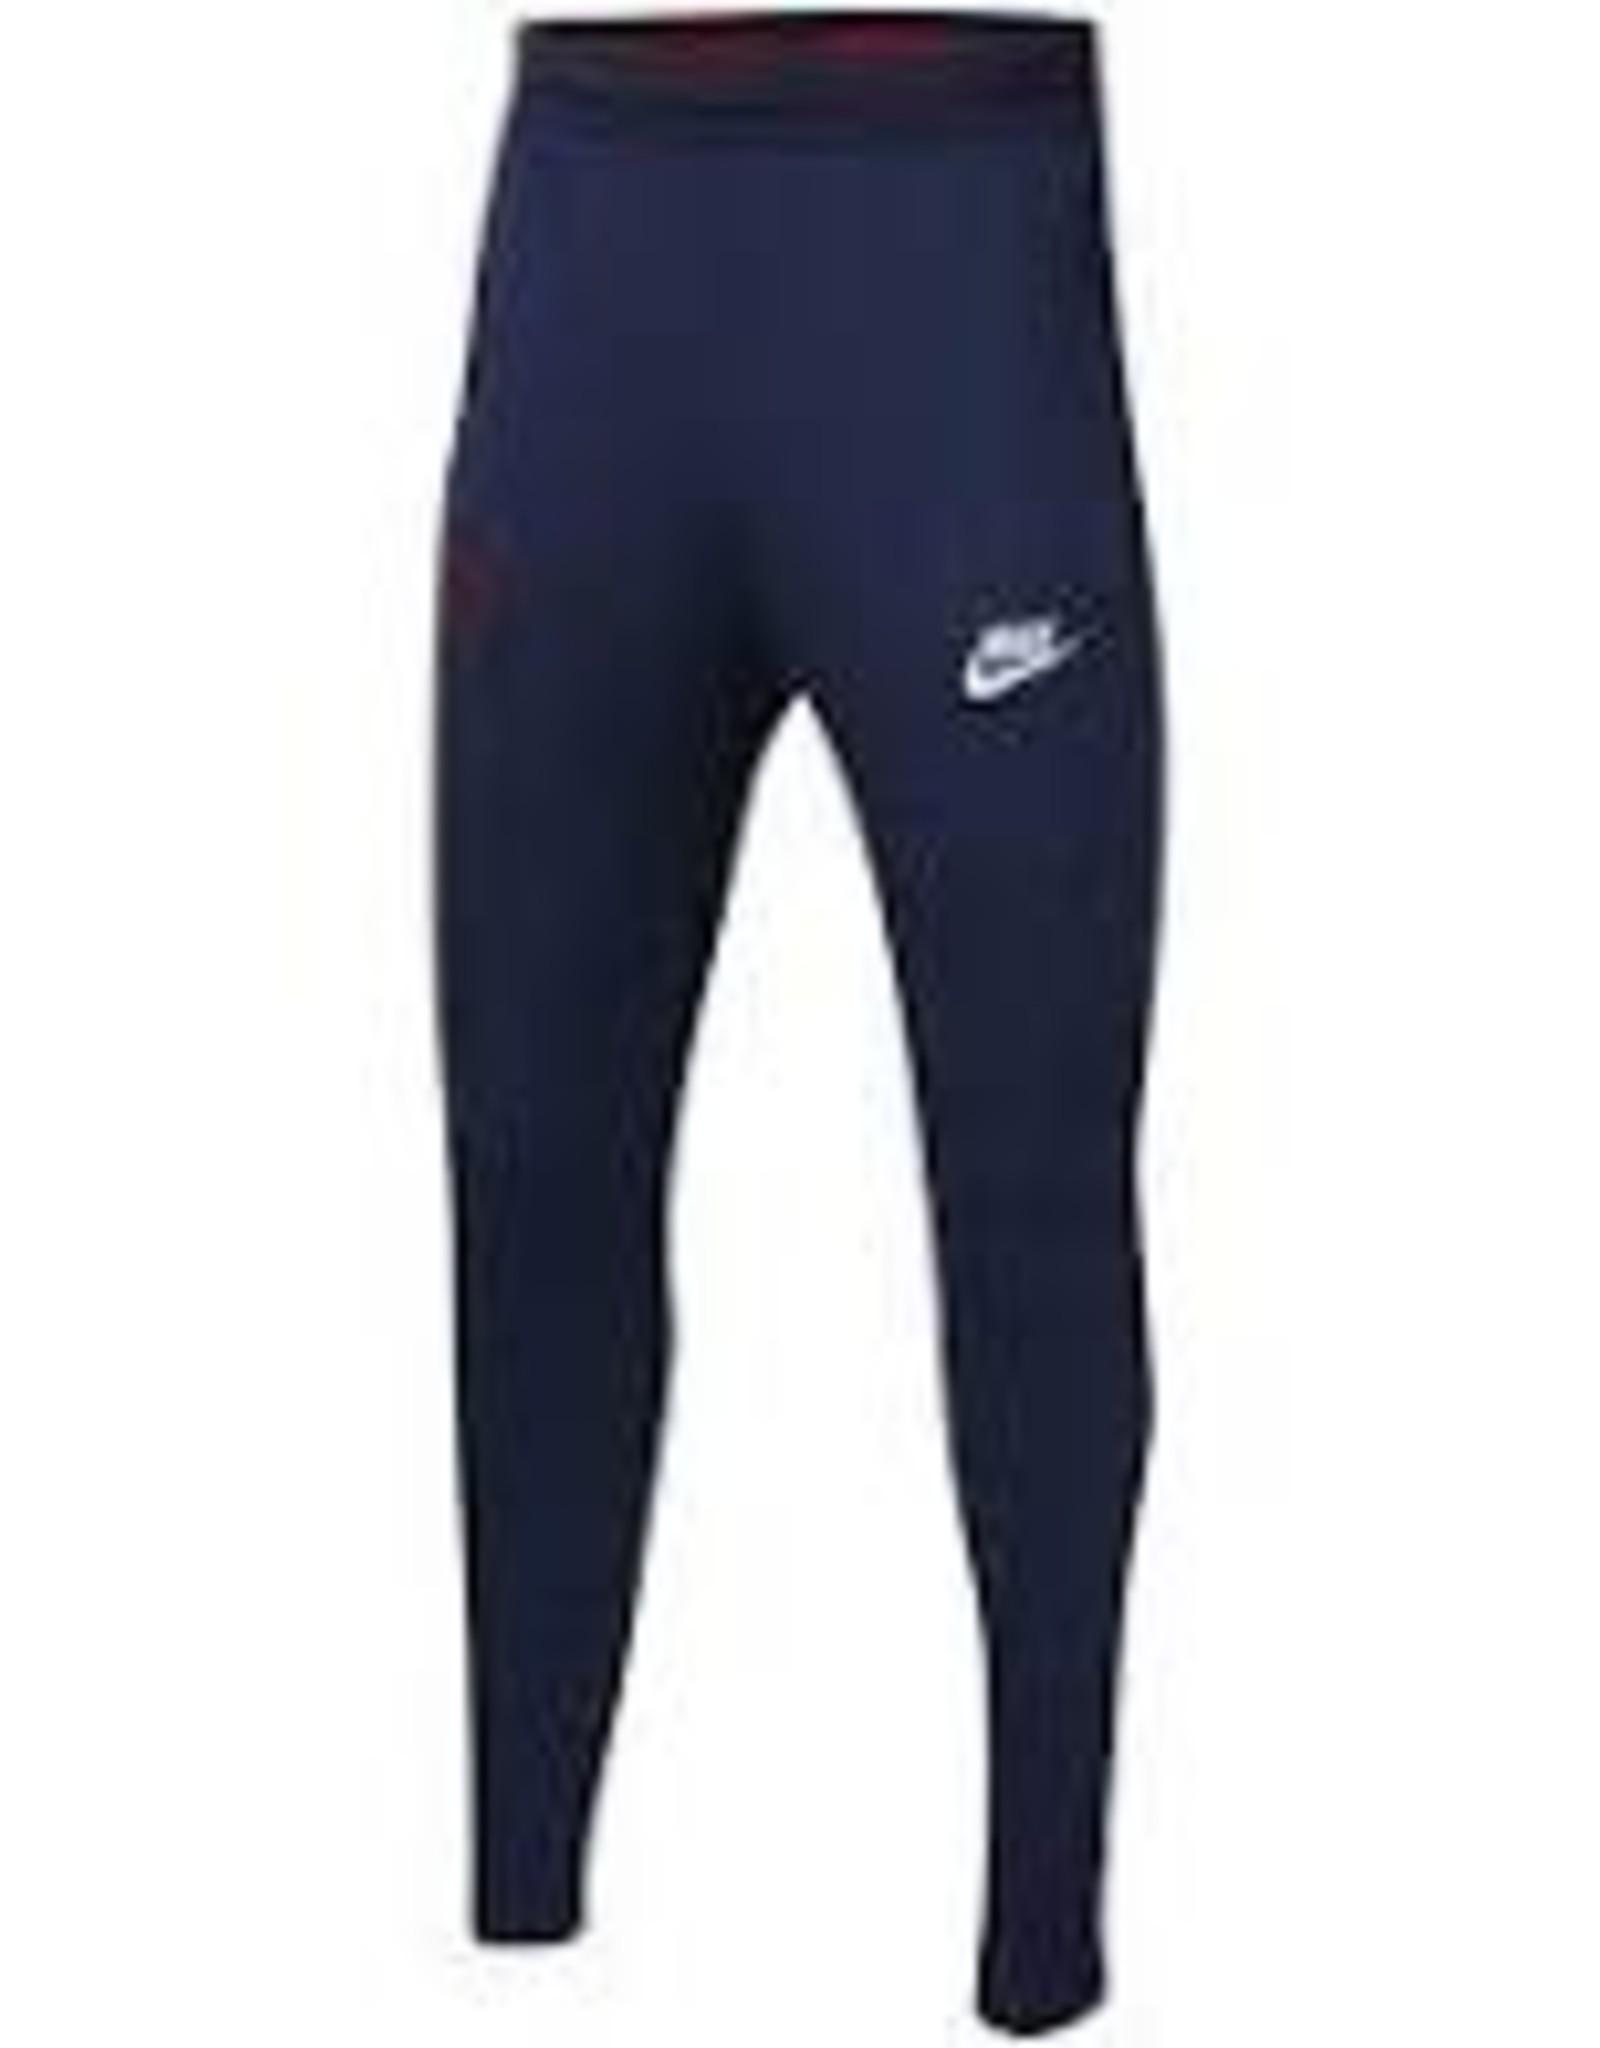 Nike psg broek kids ao6363